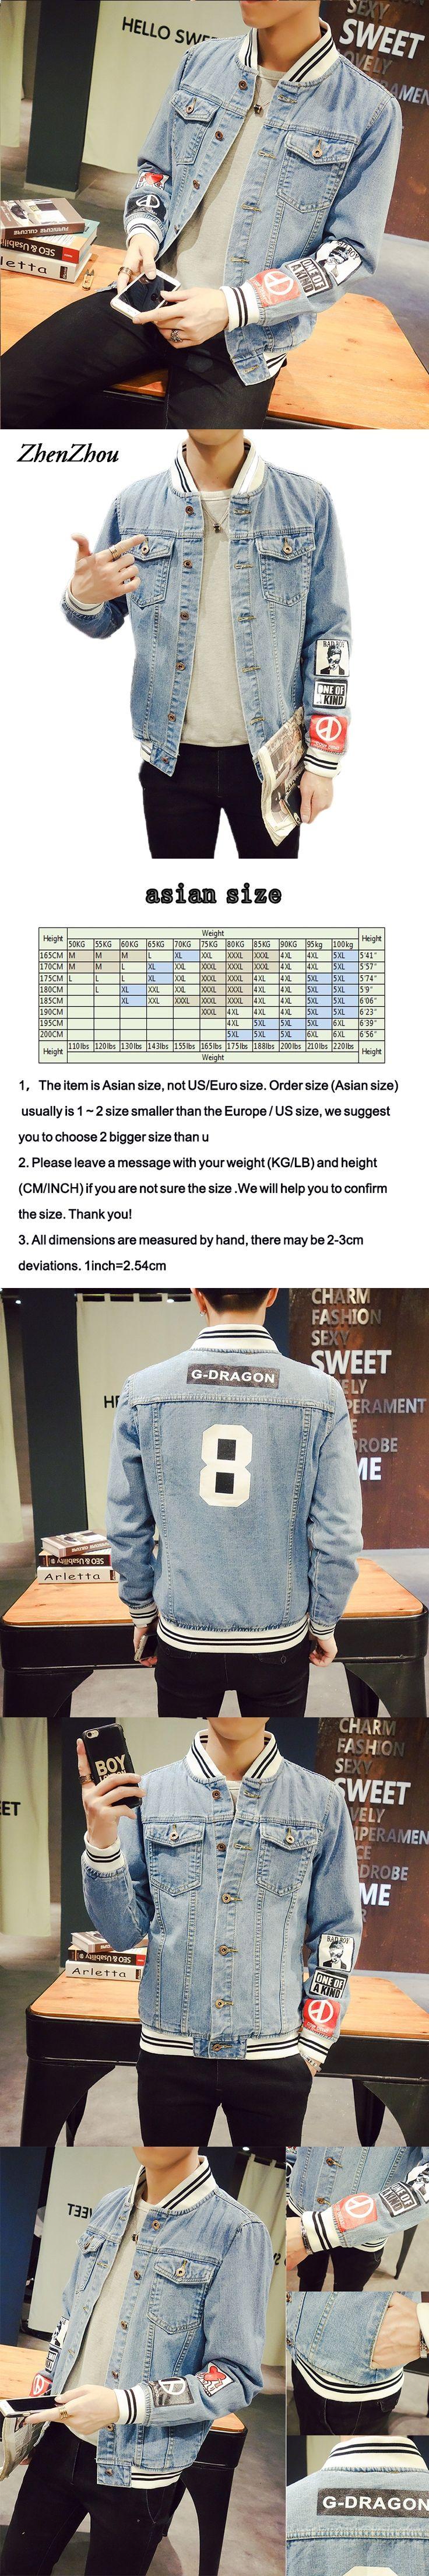 ZhenZhou S-5XL Denim Stand Collar Jeans Jacket Men JC46  Bomber Jacket Men Veste Homme Chaquetas Hombre 2016